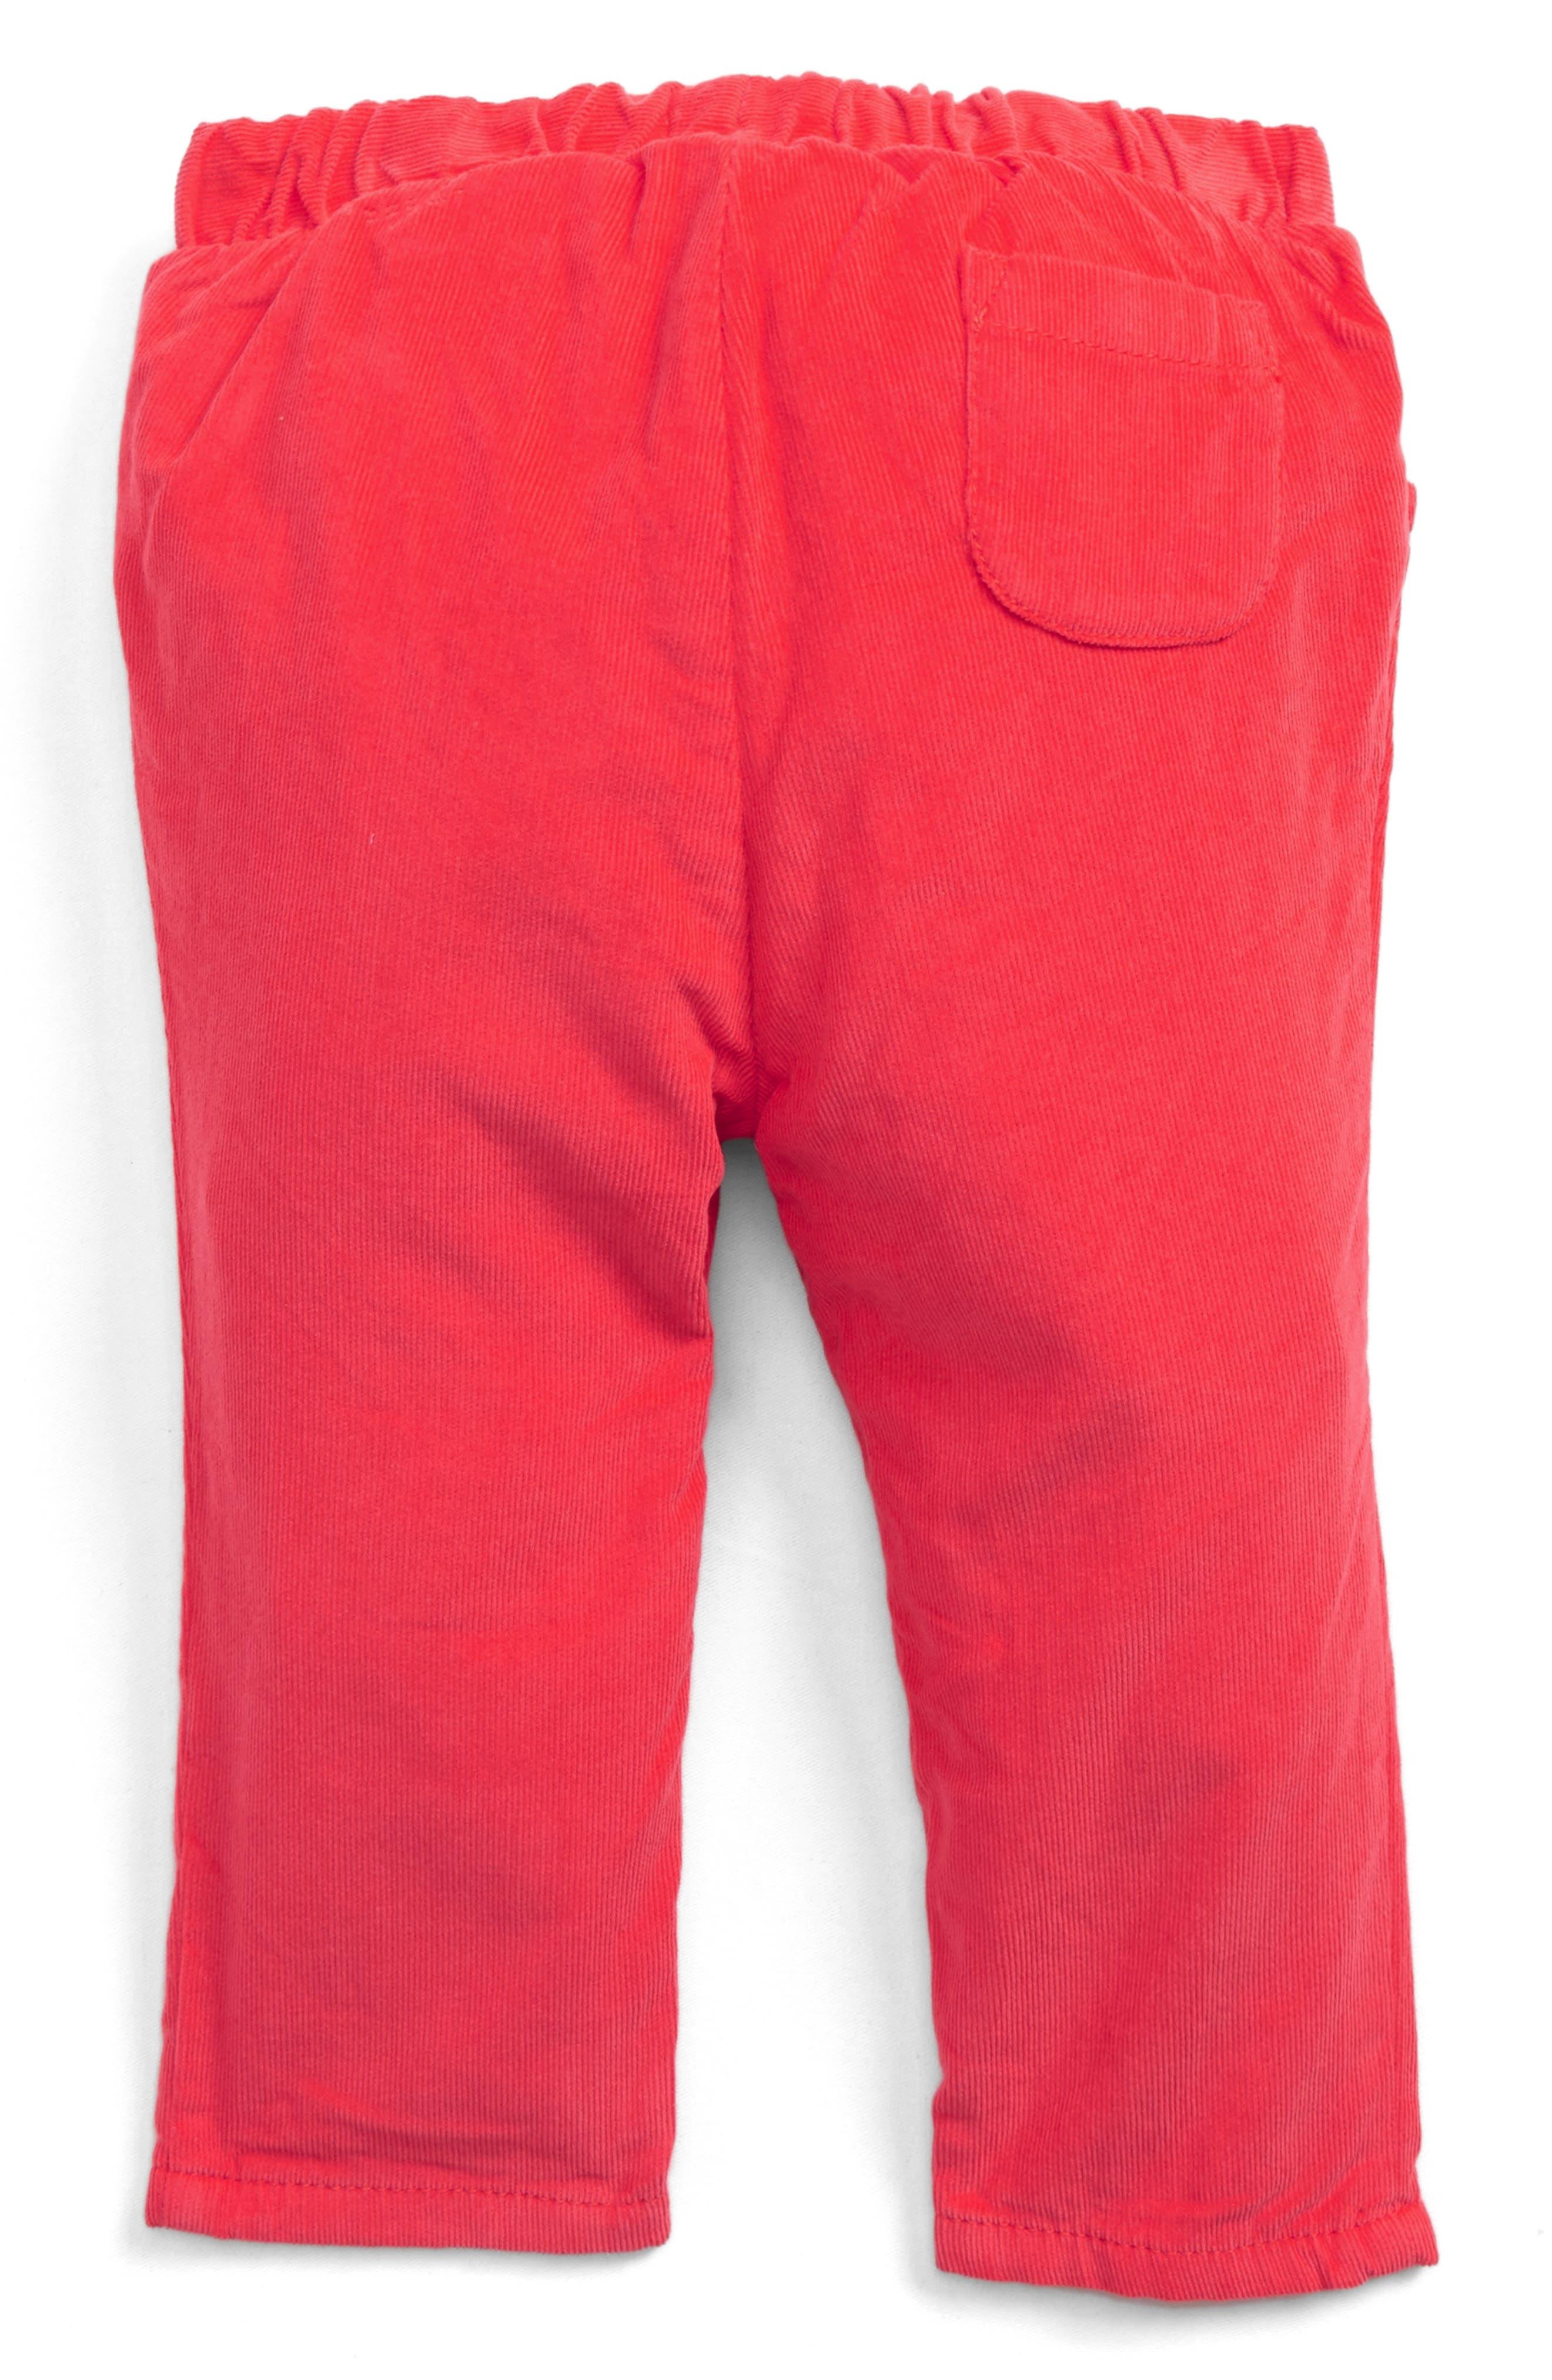 Alternate Image 2  - Mini Boden Corduroy Pants (Baby Girls & Toddler Girls)